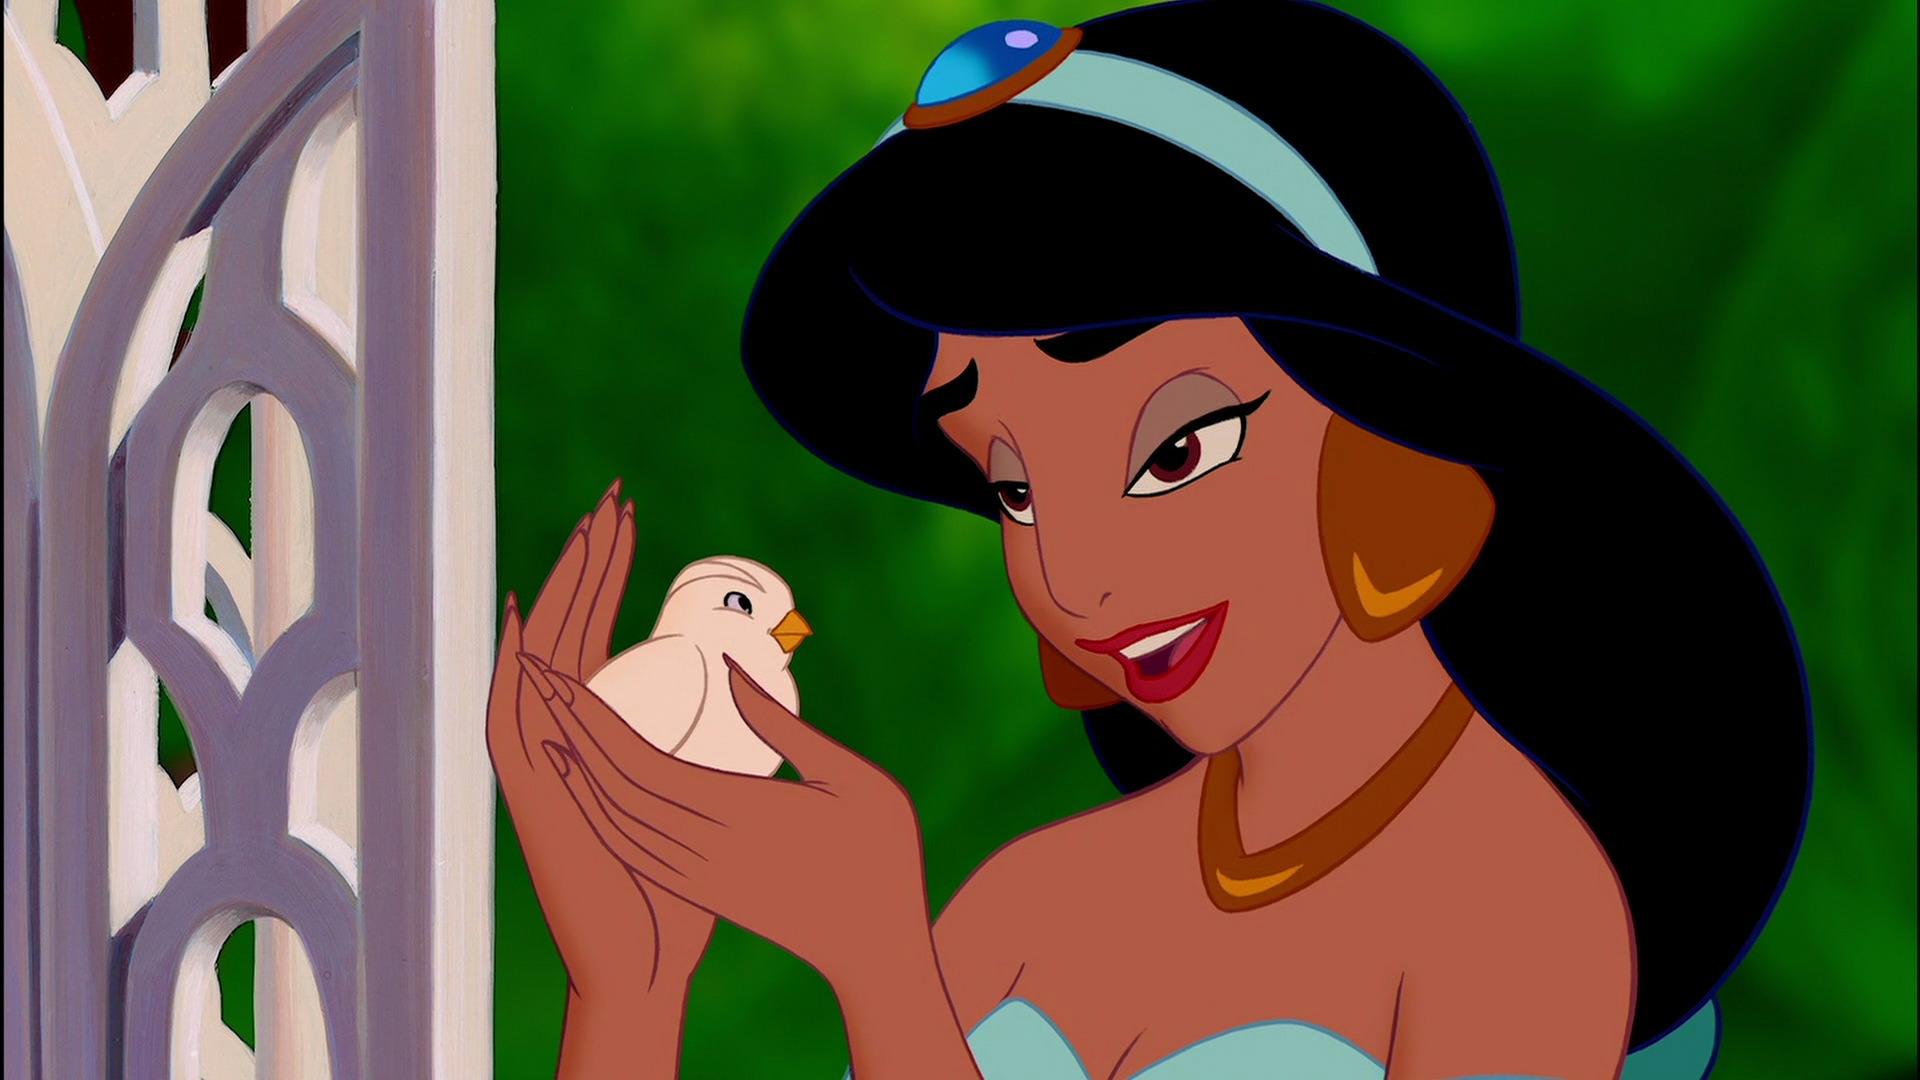 Tiger Live Wallpaper Hd Disney Princess Profiles Jasmine Rotoscopers